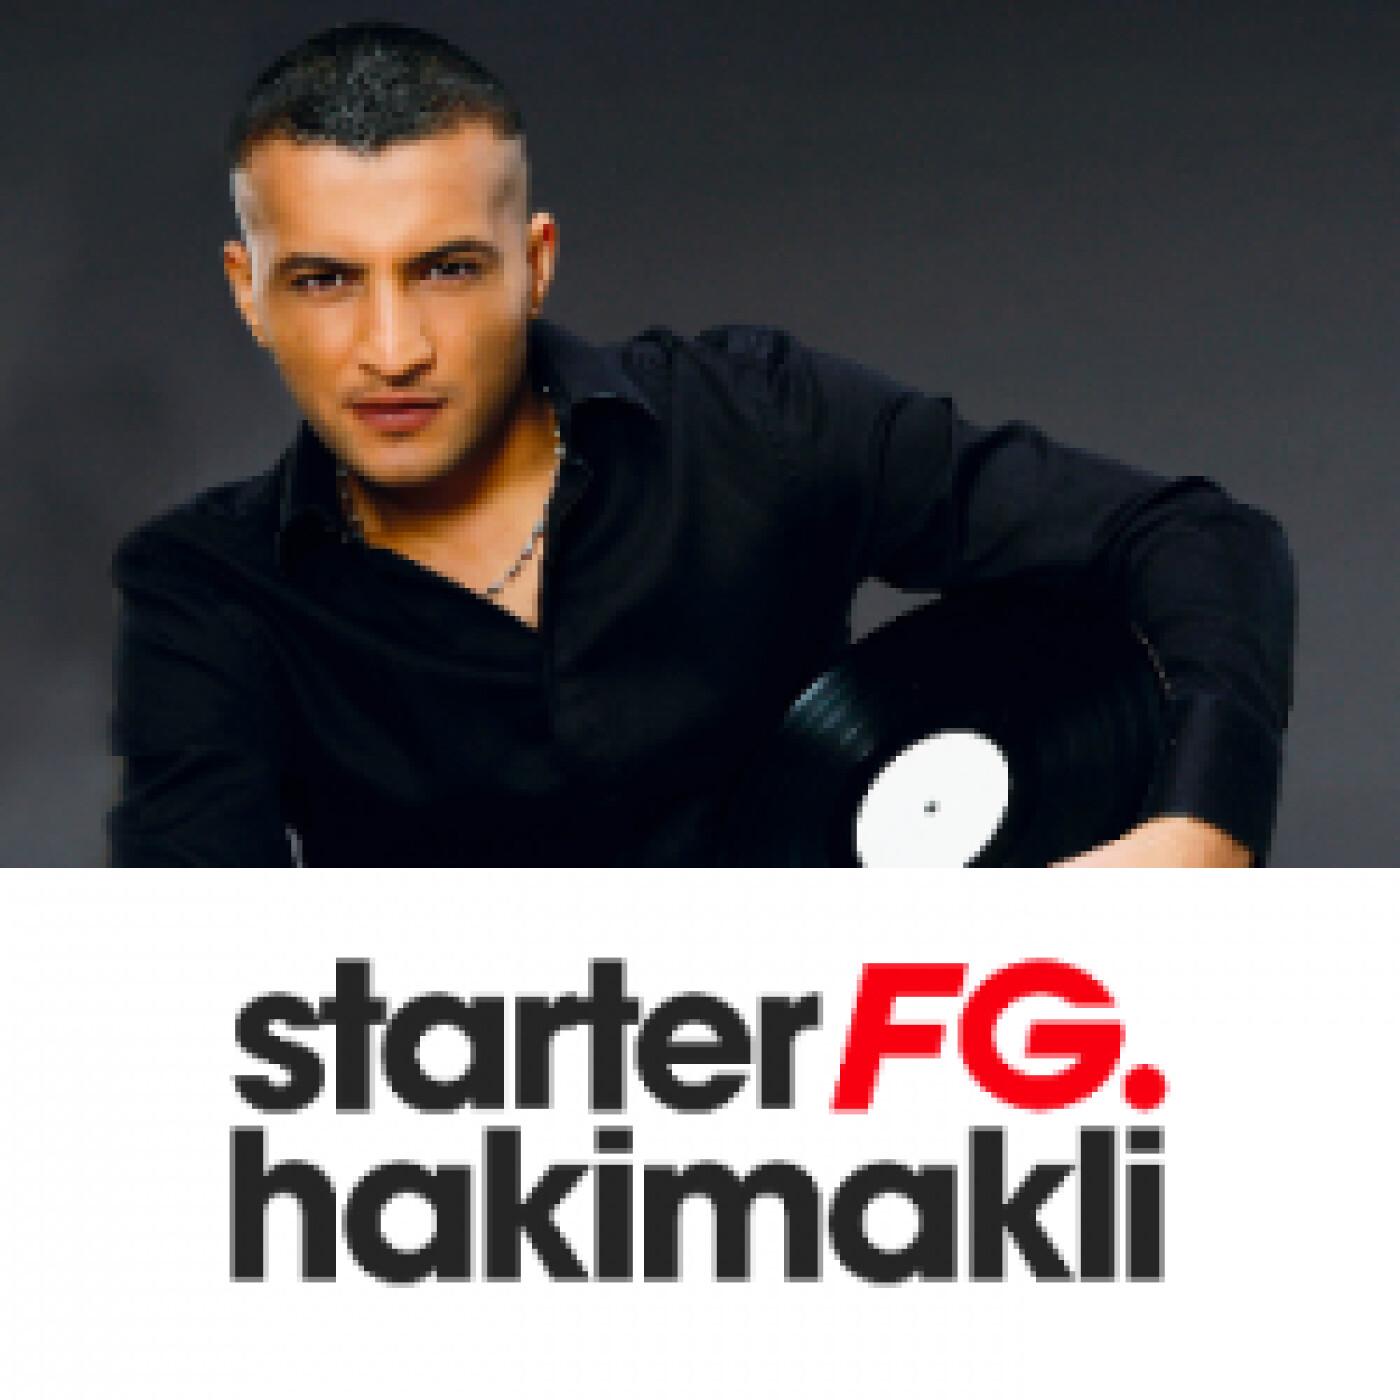 STARTER FG BY HAKIMAKLI MERCREDI 3 MARS 2021